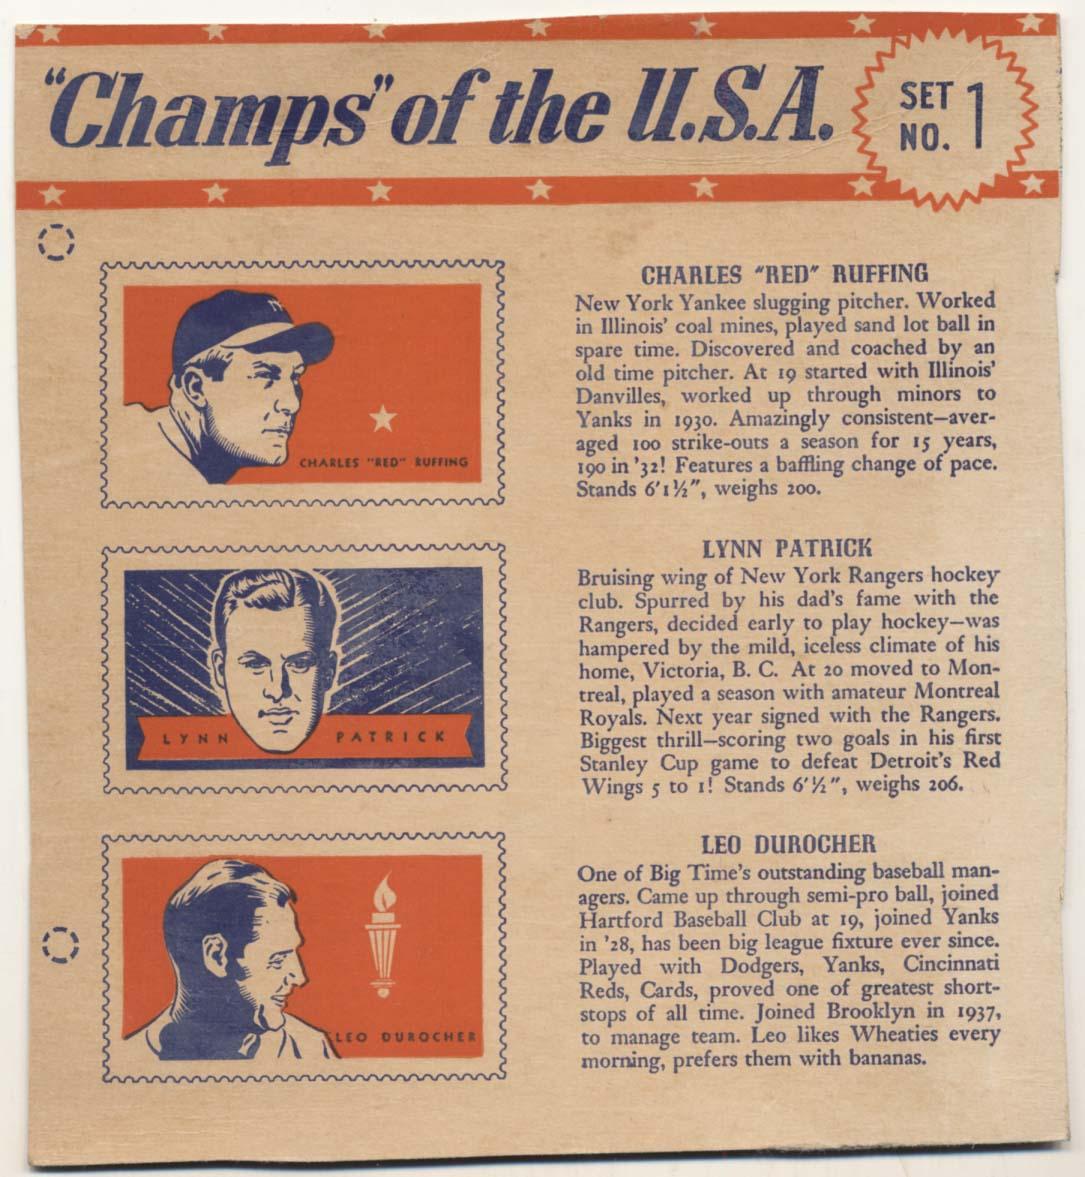 Lot #191 1940 Wheaties Champs USA # 1.1 Durocher/Patrick/Ruffing Cond: VG-Ex (no bottom tab)